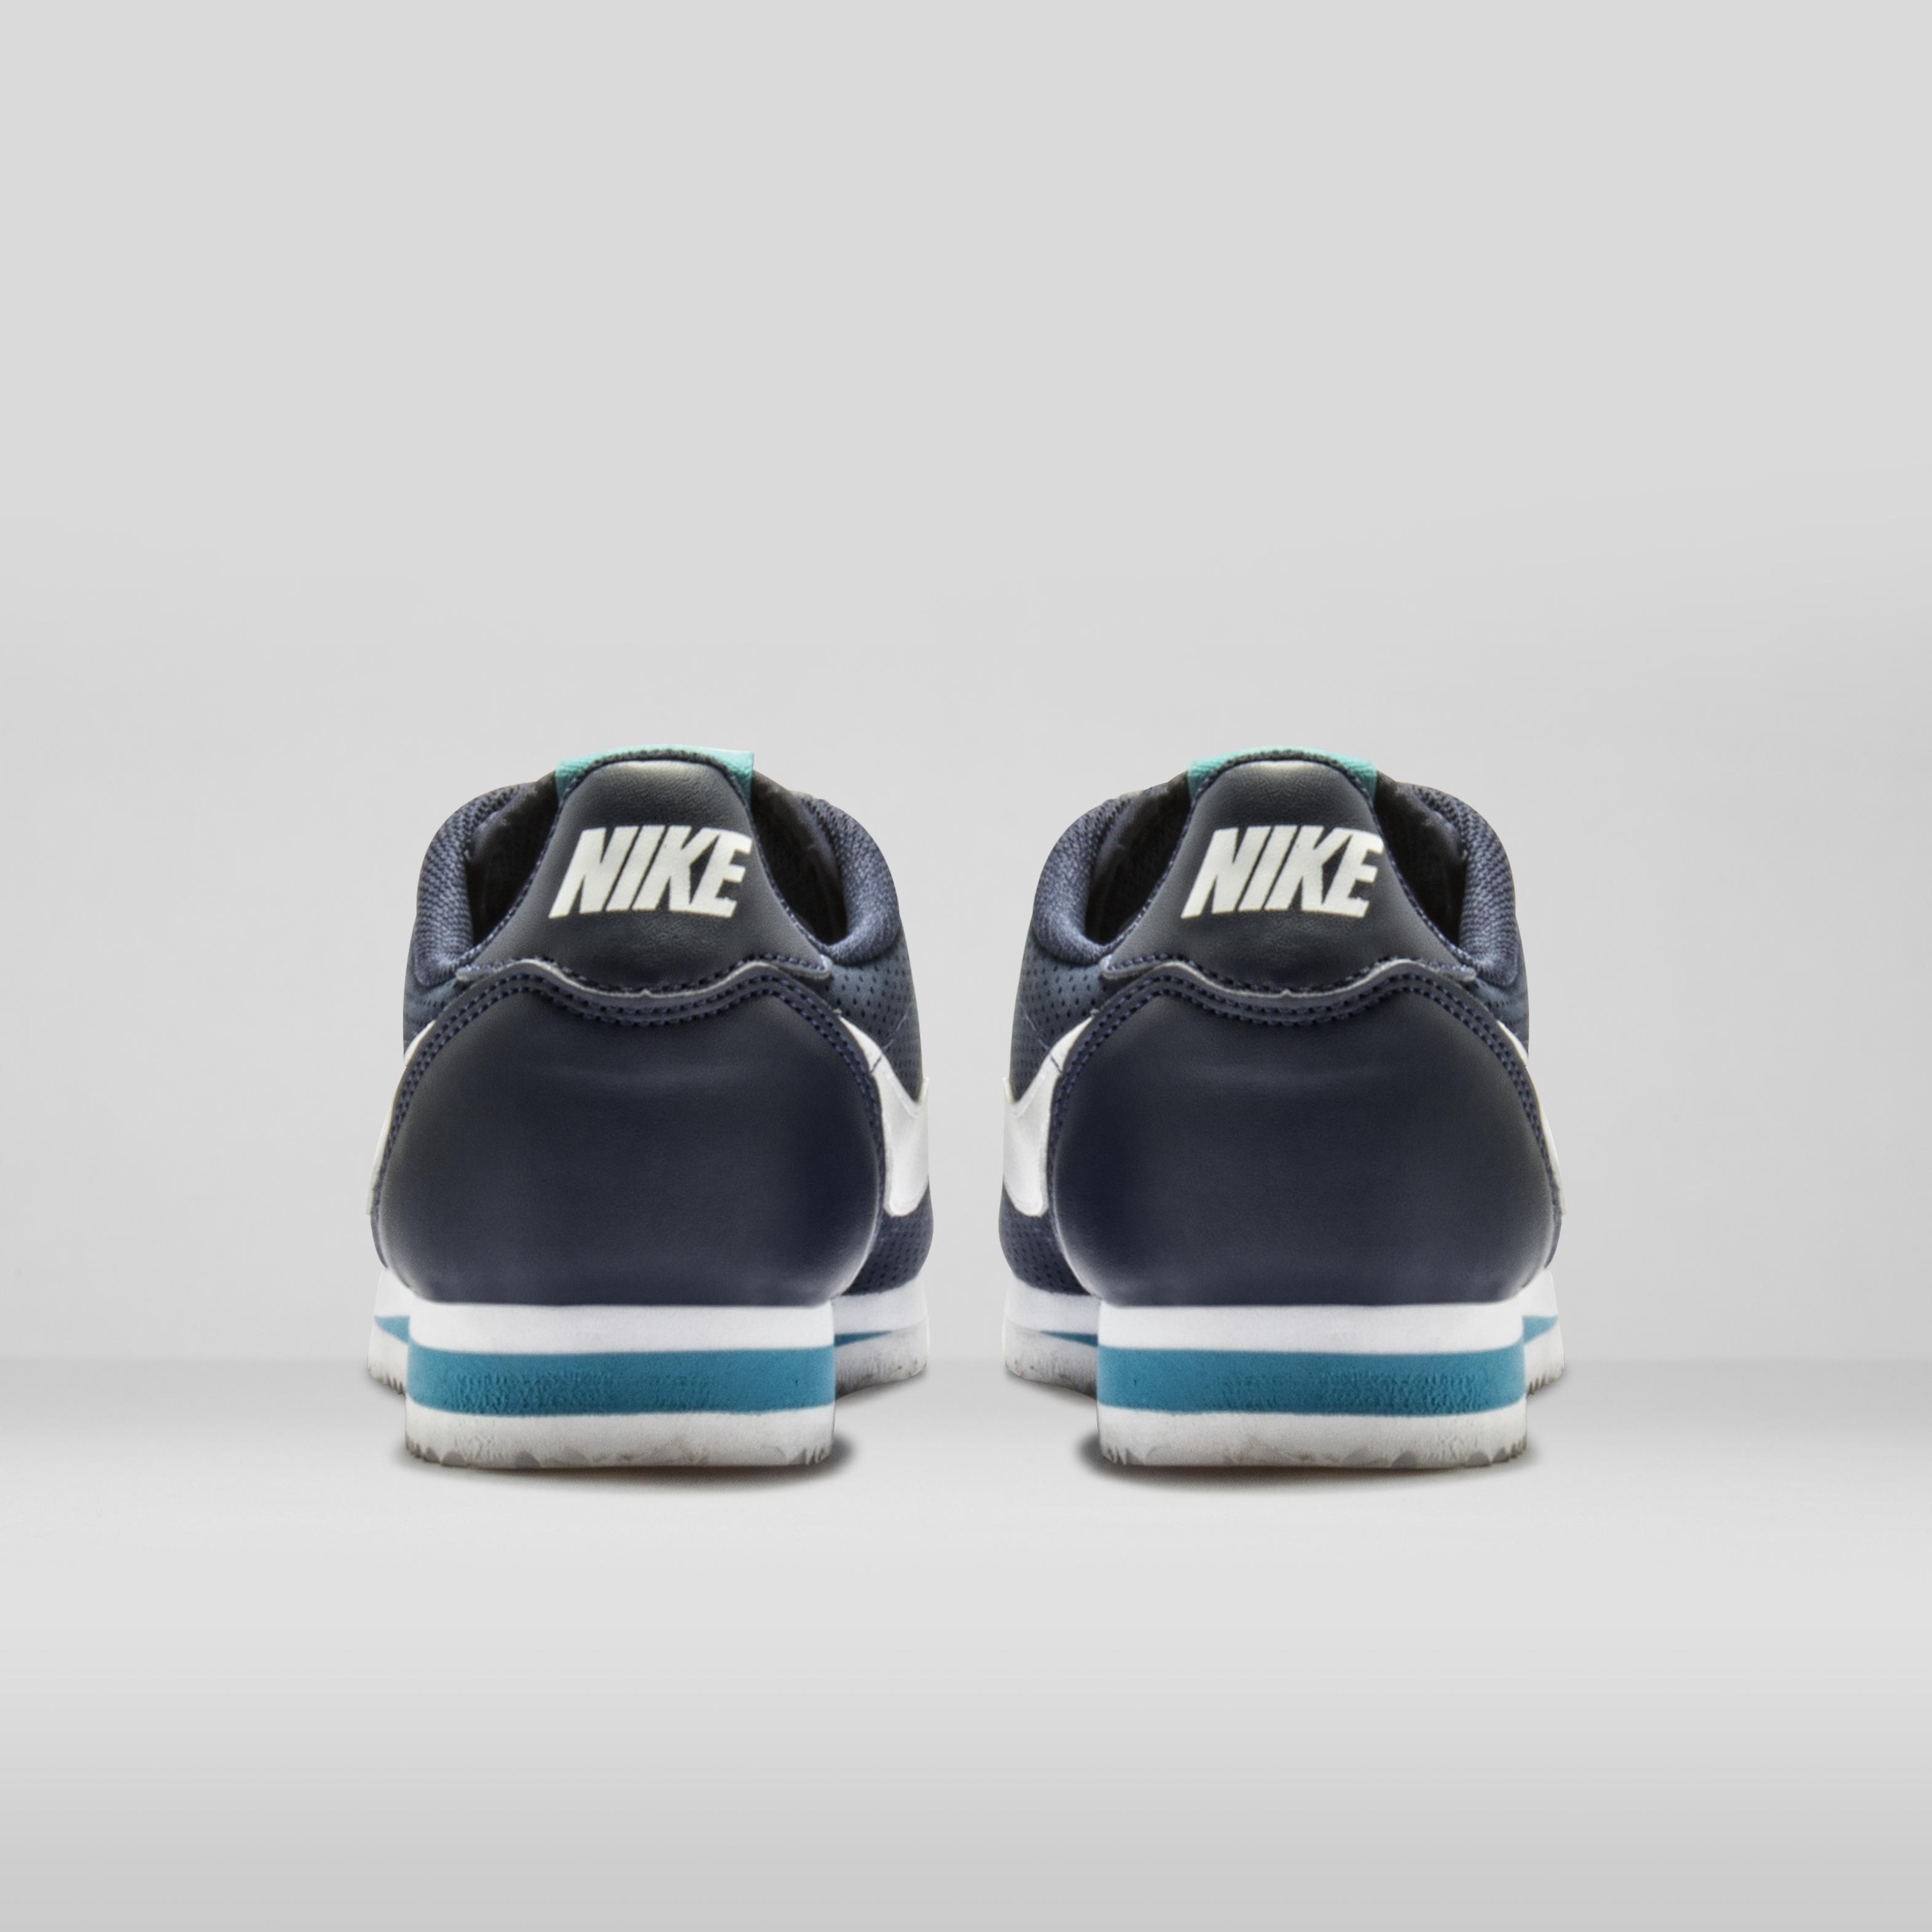 Nike relan 231 a t 234 nis que ficou famoso em forrest gump